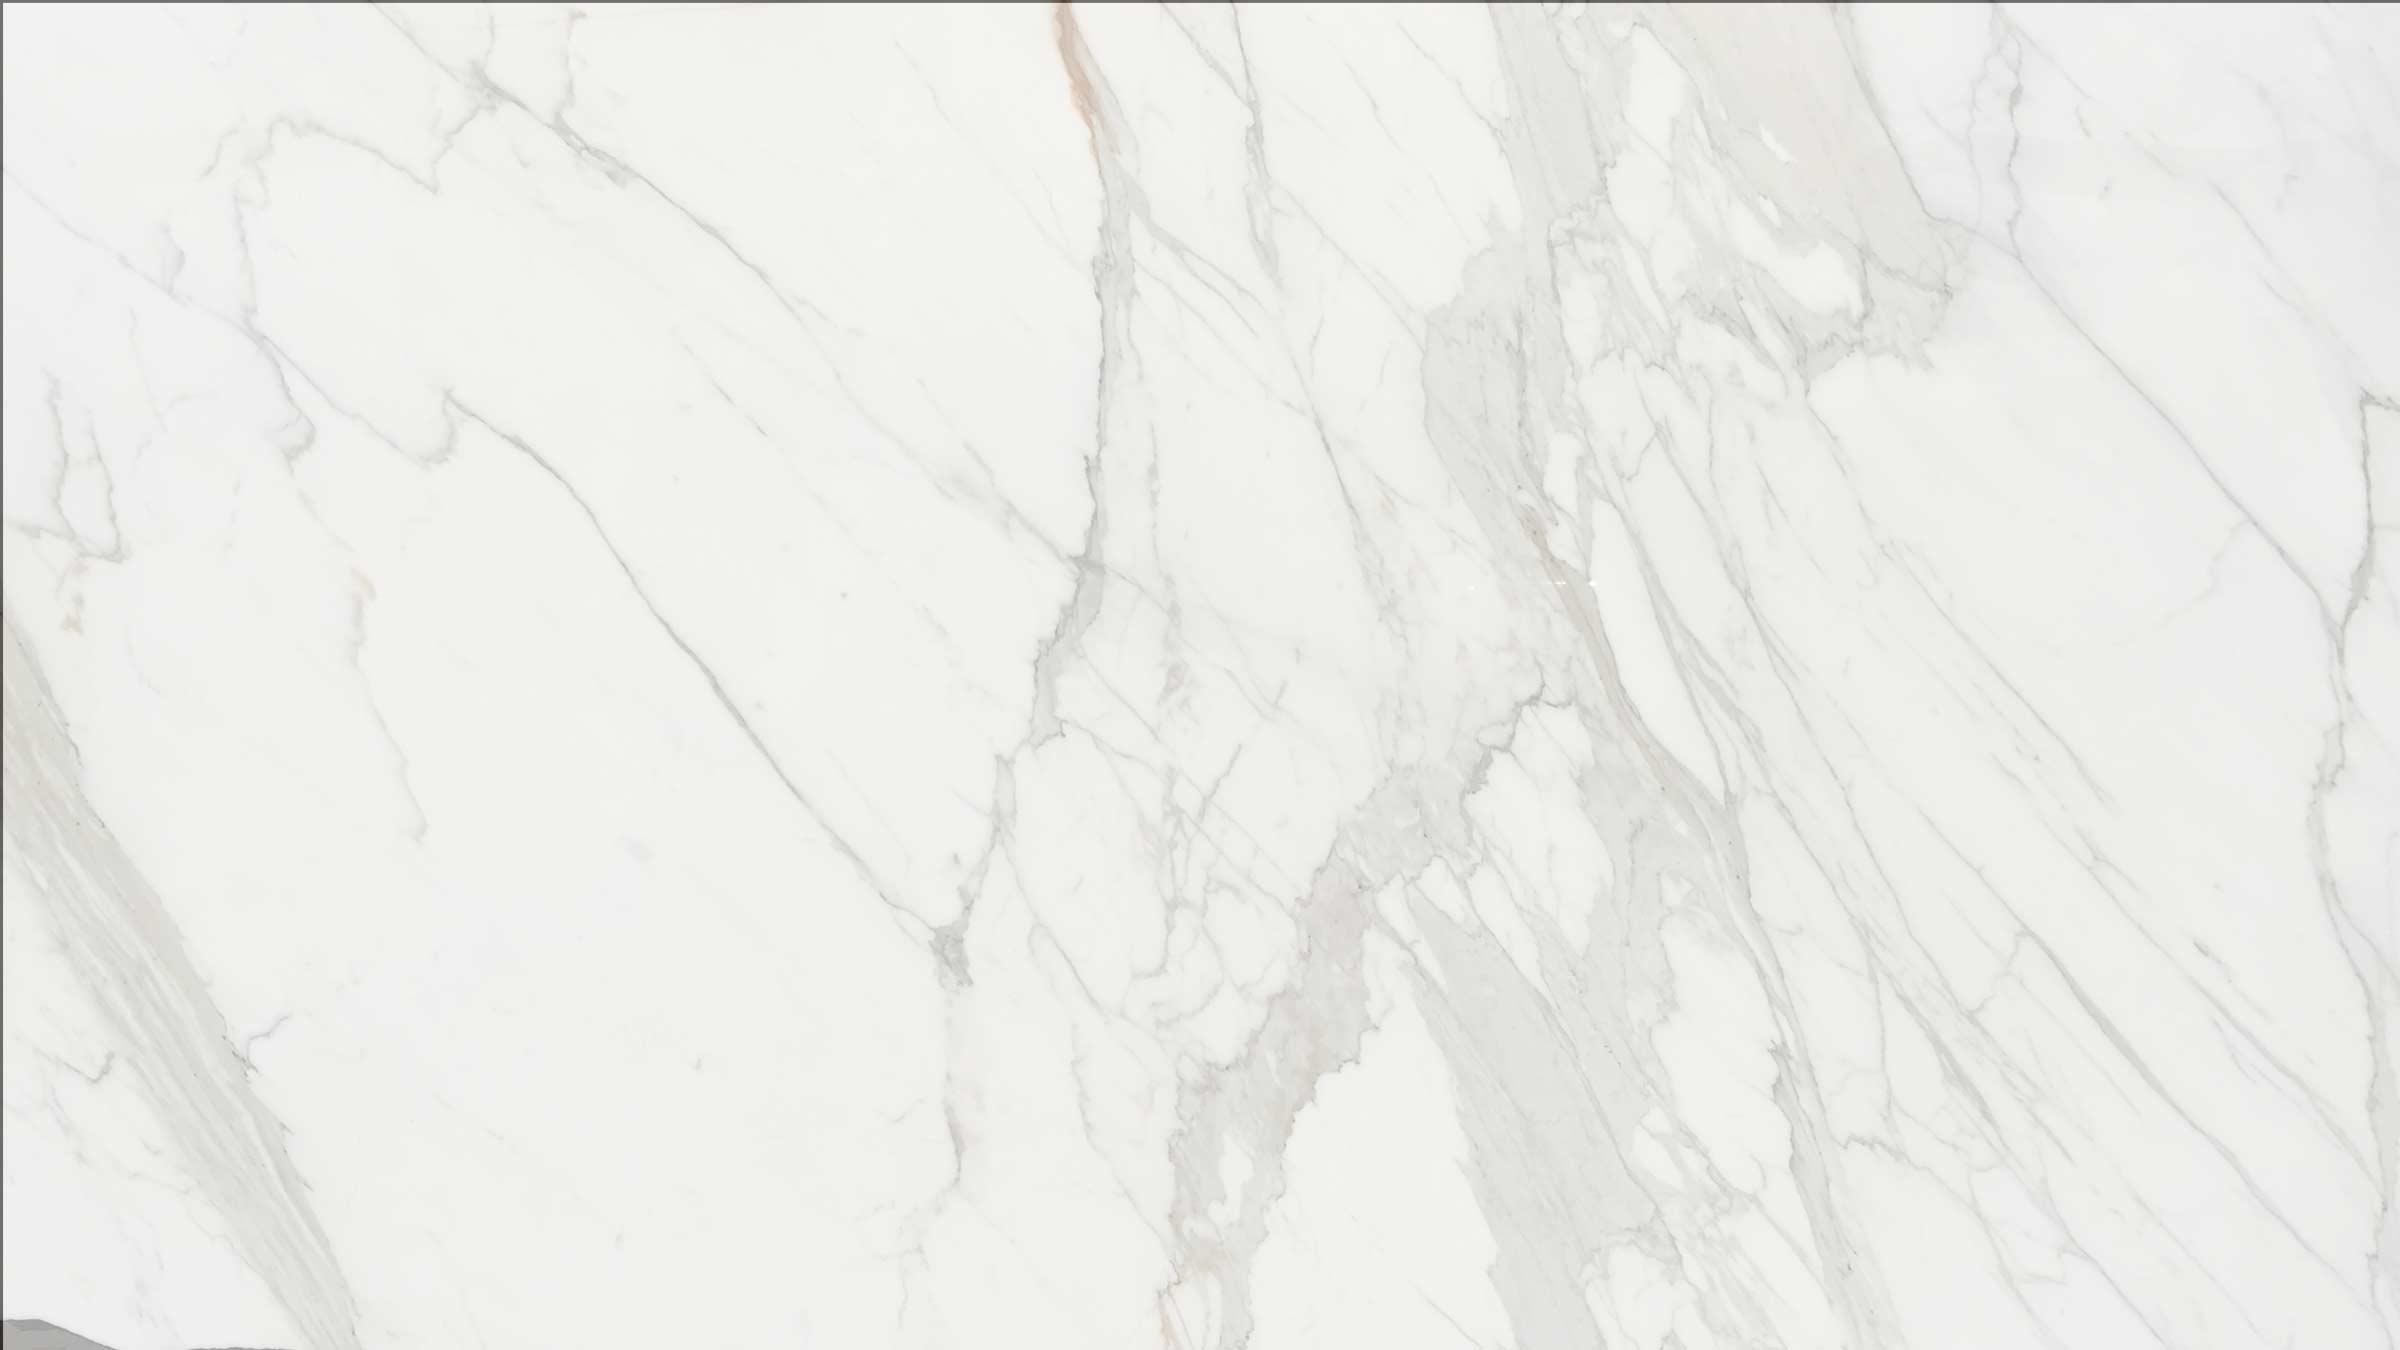 White Marble Gemstone : رخام ابيض white marble شركة بدء الانجاز للرخام باجكو bajco